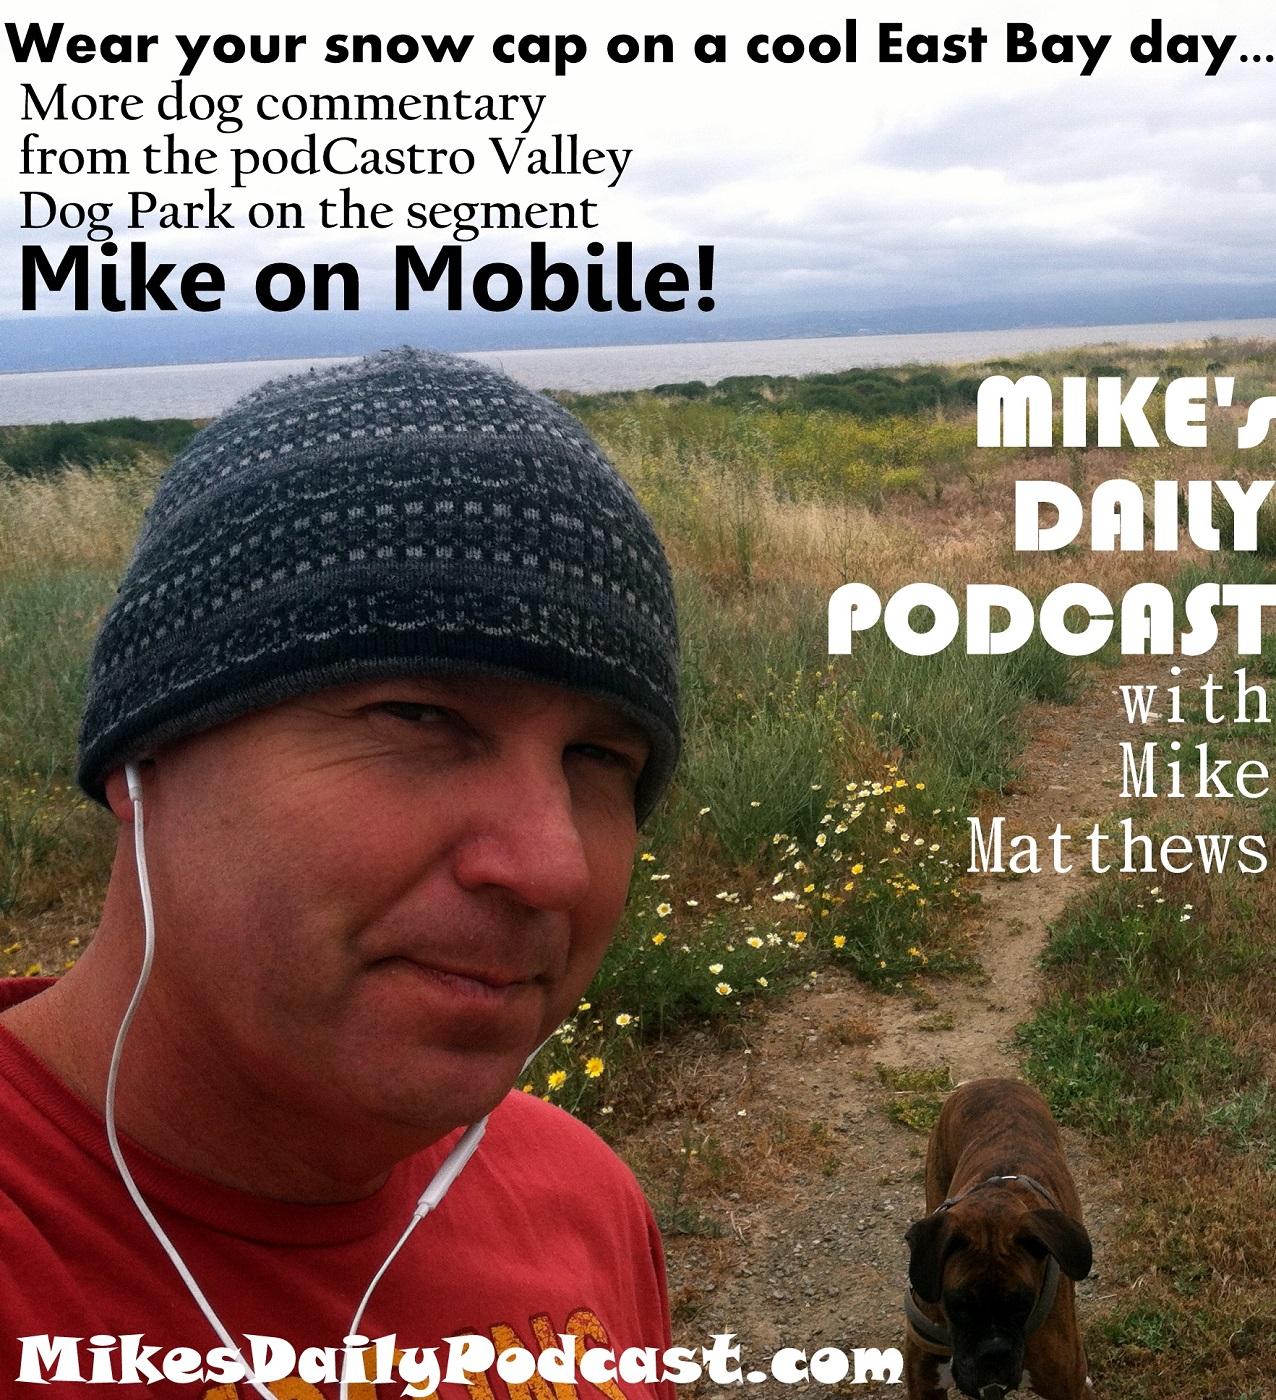 MIKEs DAILY PODCAST 7-9-15 Hayward Regional Shoreline CV Dog Park